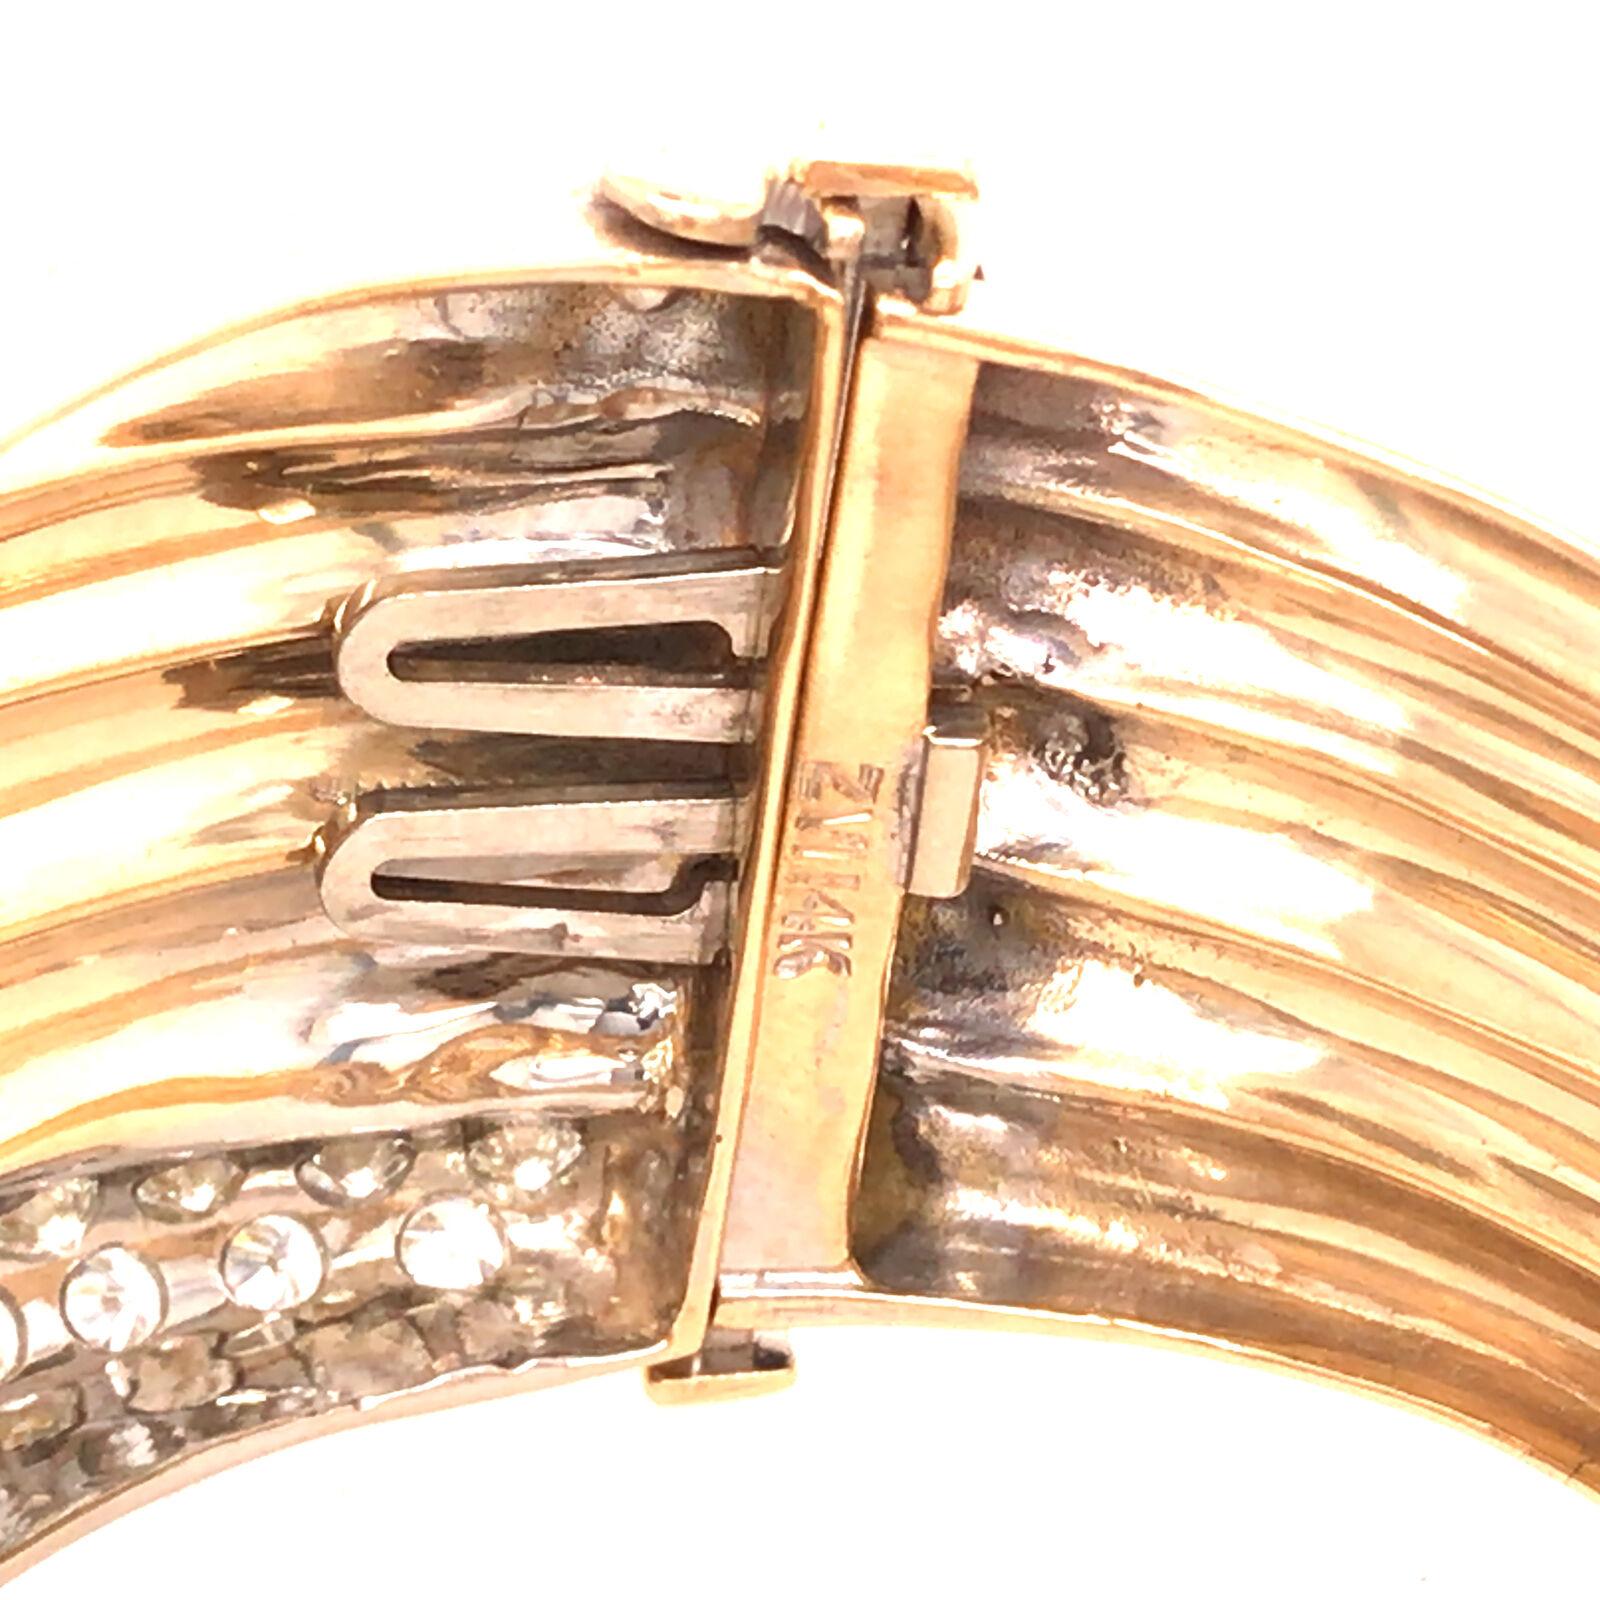 14K Wide Diamond Twist Cuff Two-Tone Gold - image 8